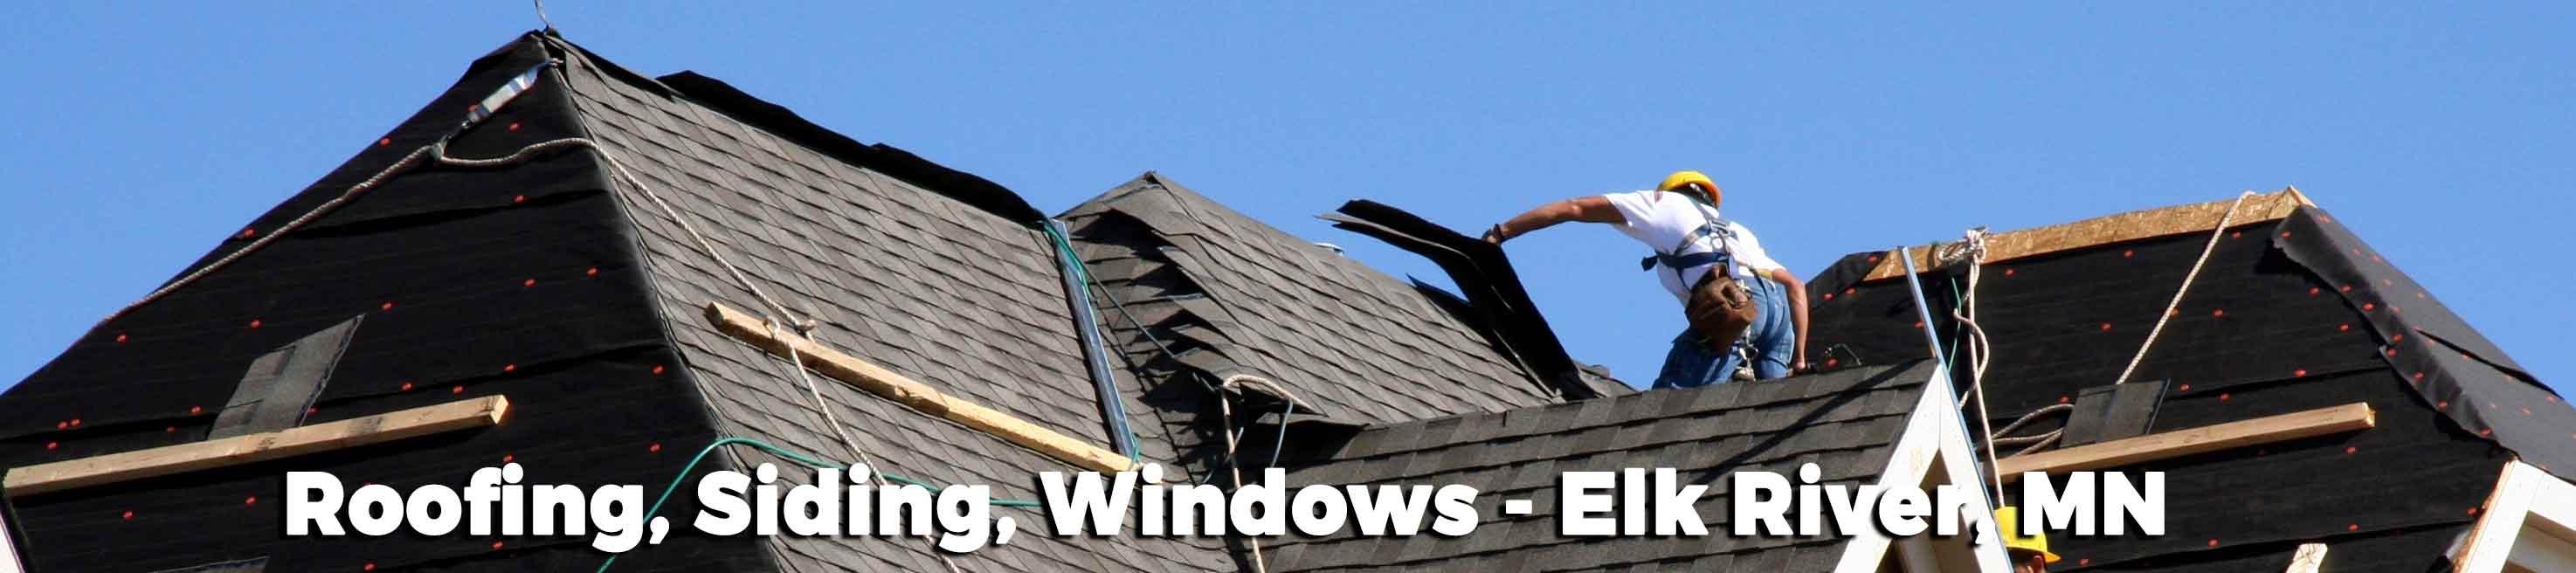 roofing-siding-windows-elk-river-mn